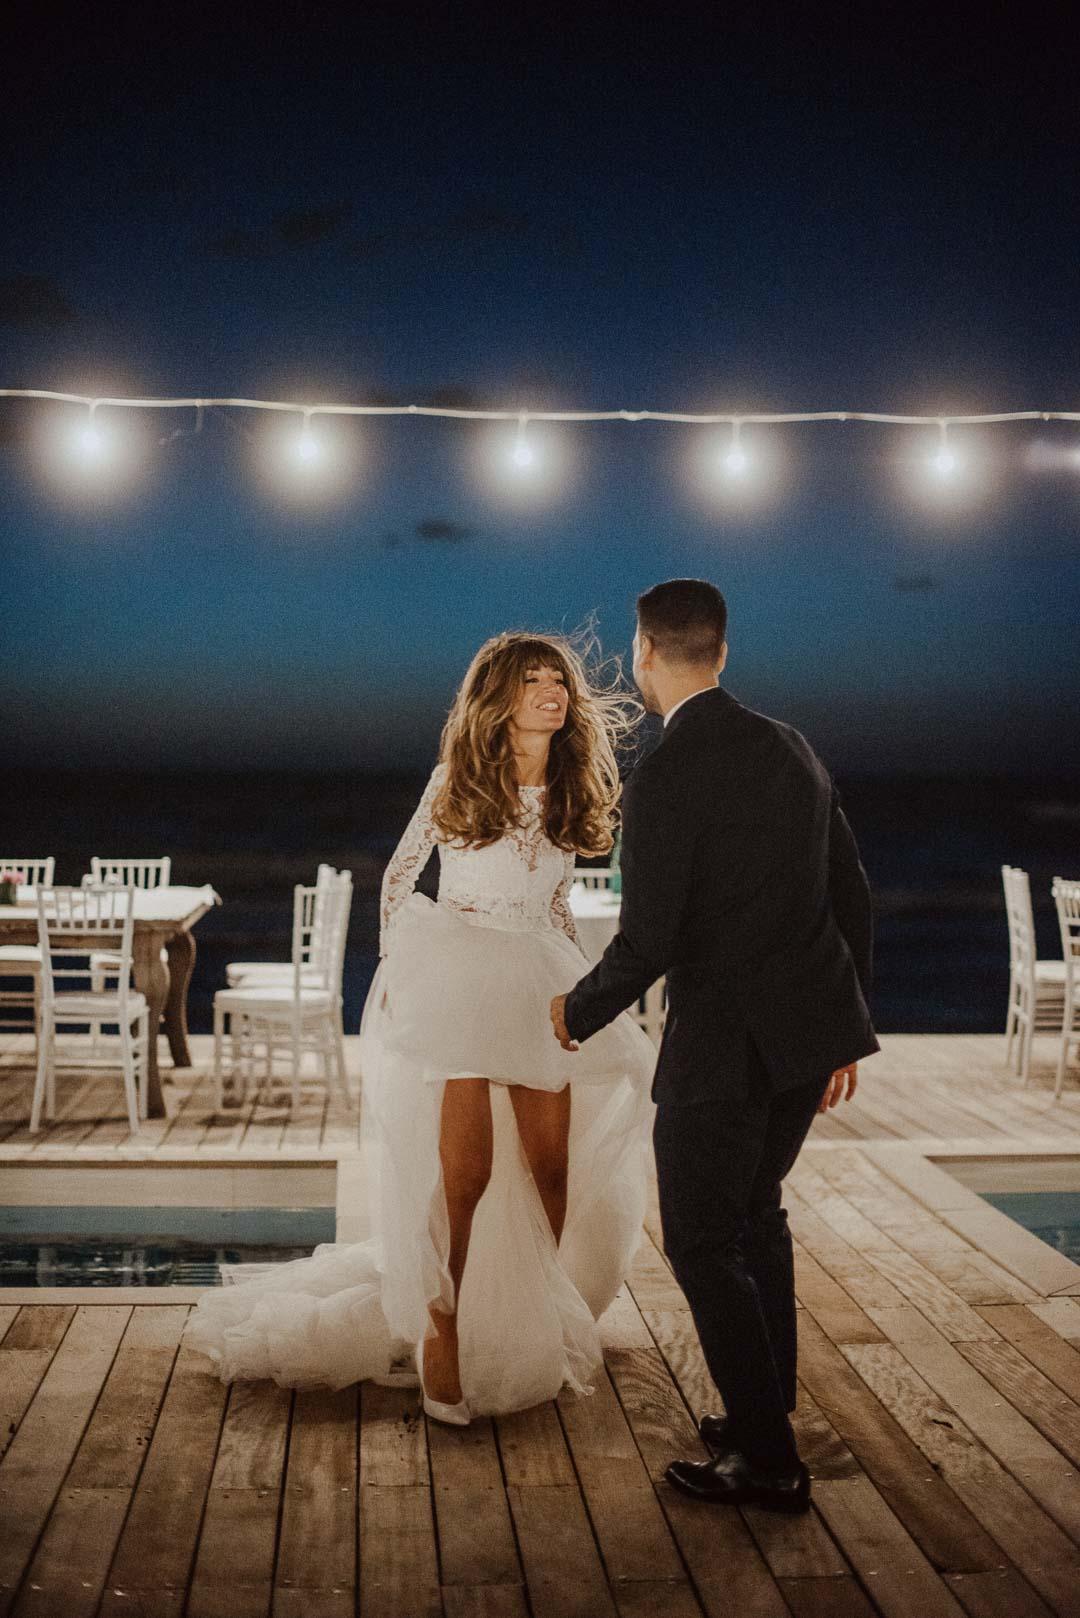 wedding-photographer-destination-fineart-bespoke-reportage-napoli-nabilah-vivianeizzo-spazio46-160